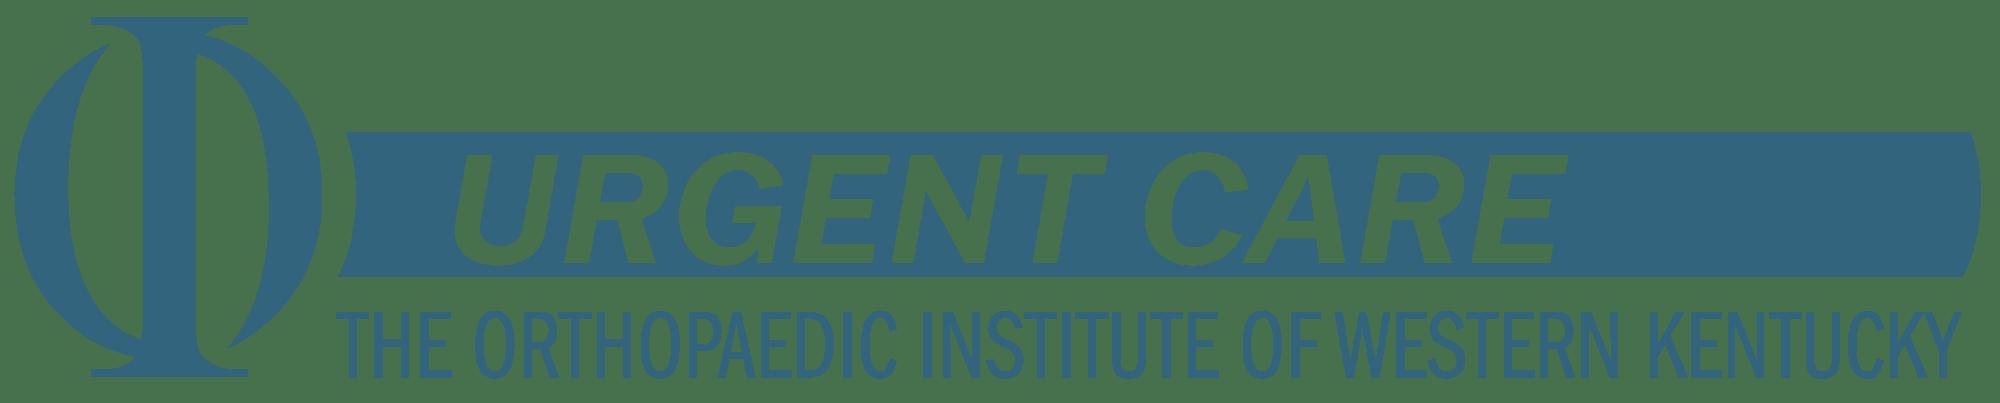 OI Western Kentucky |  Urgent Care